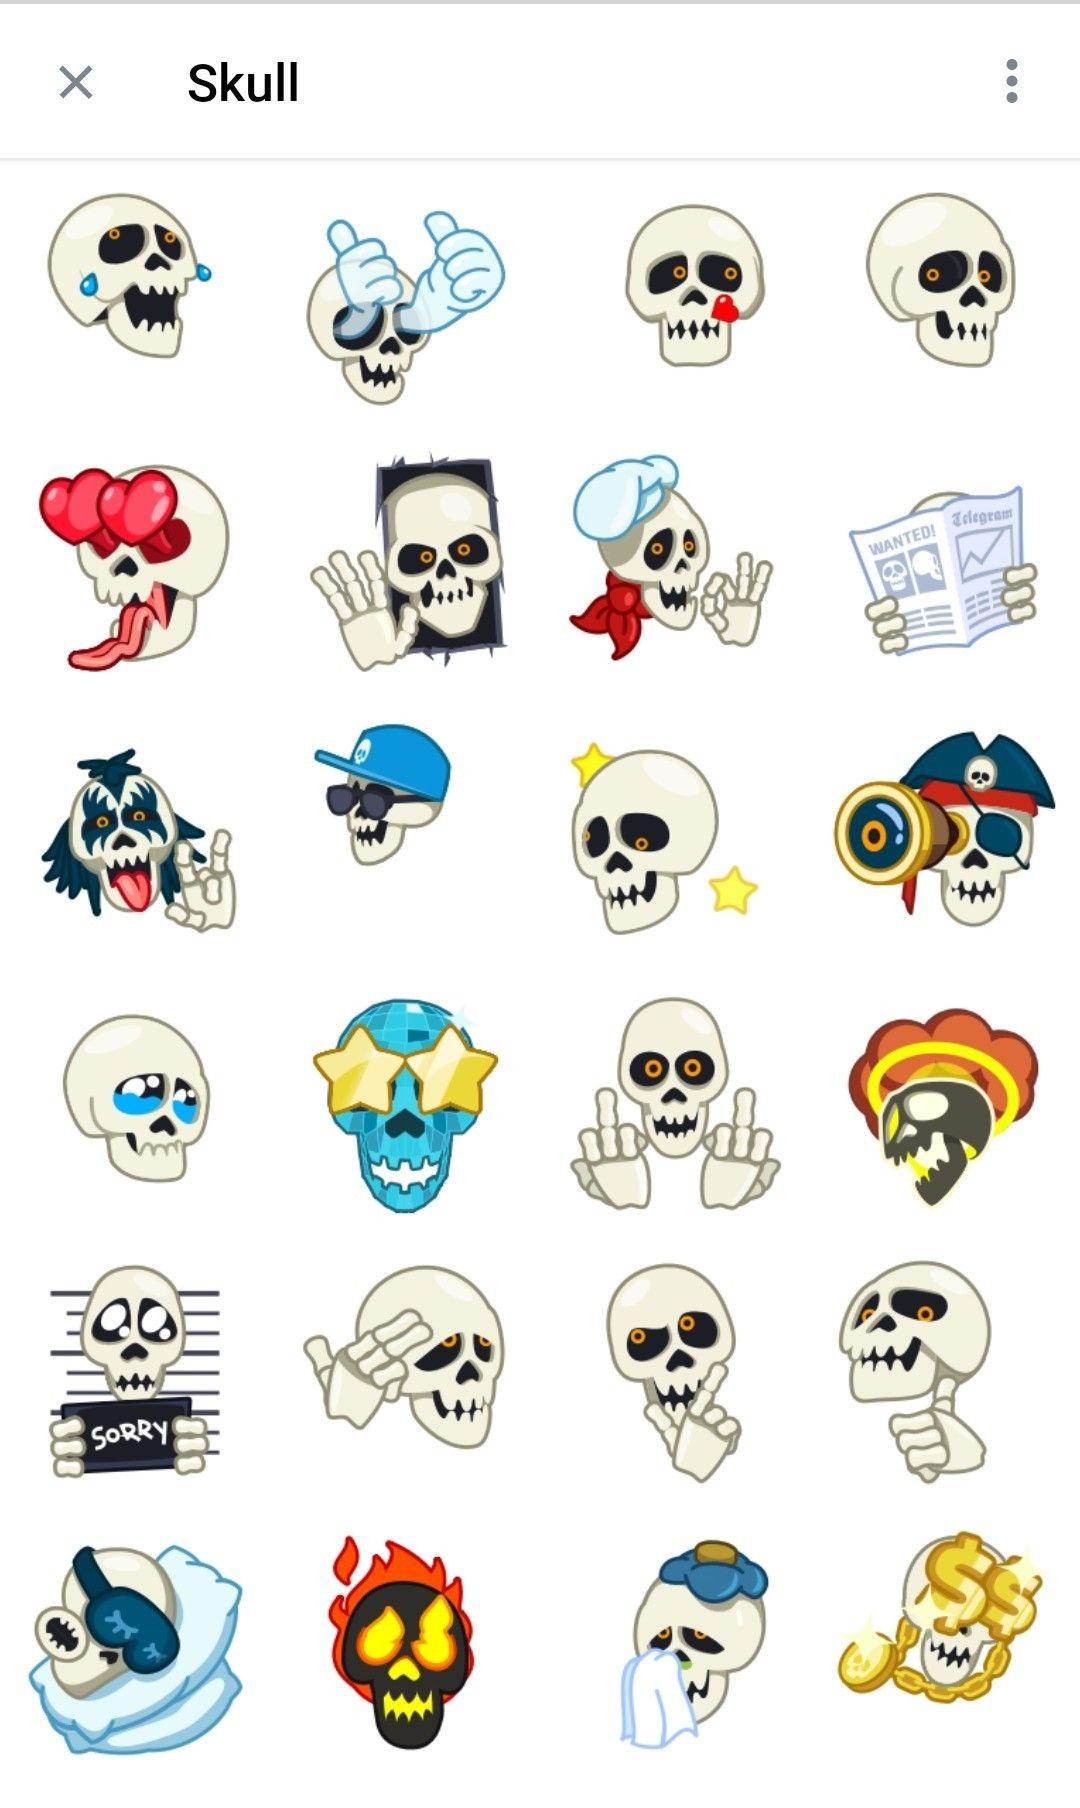 Skull Telegram Animated stickers in 2020 Animation